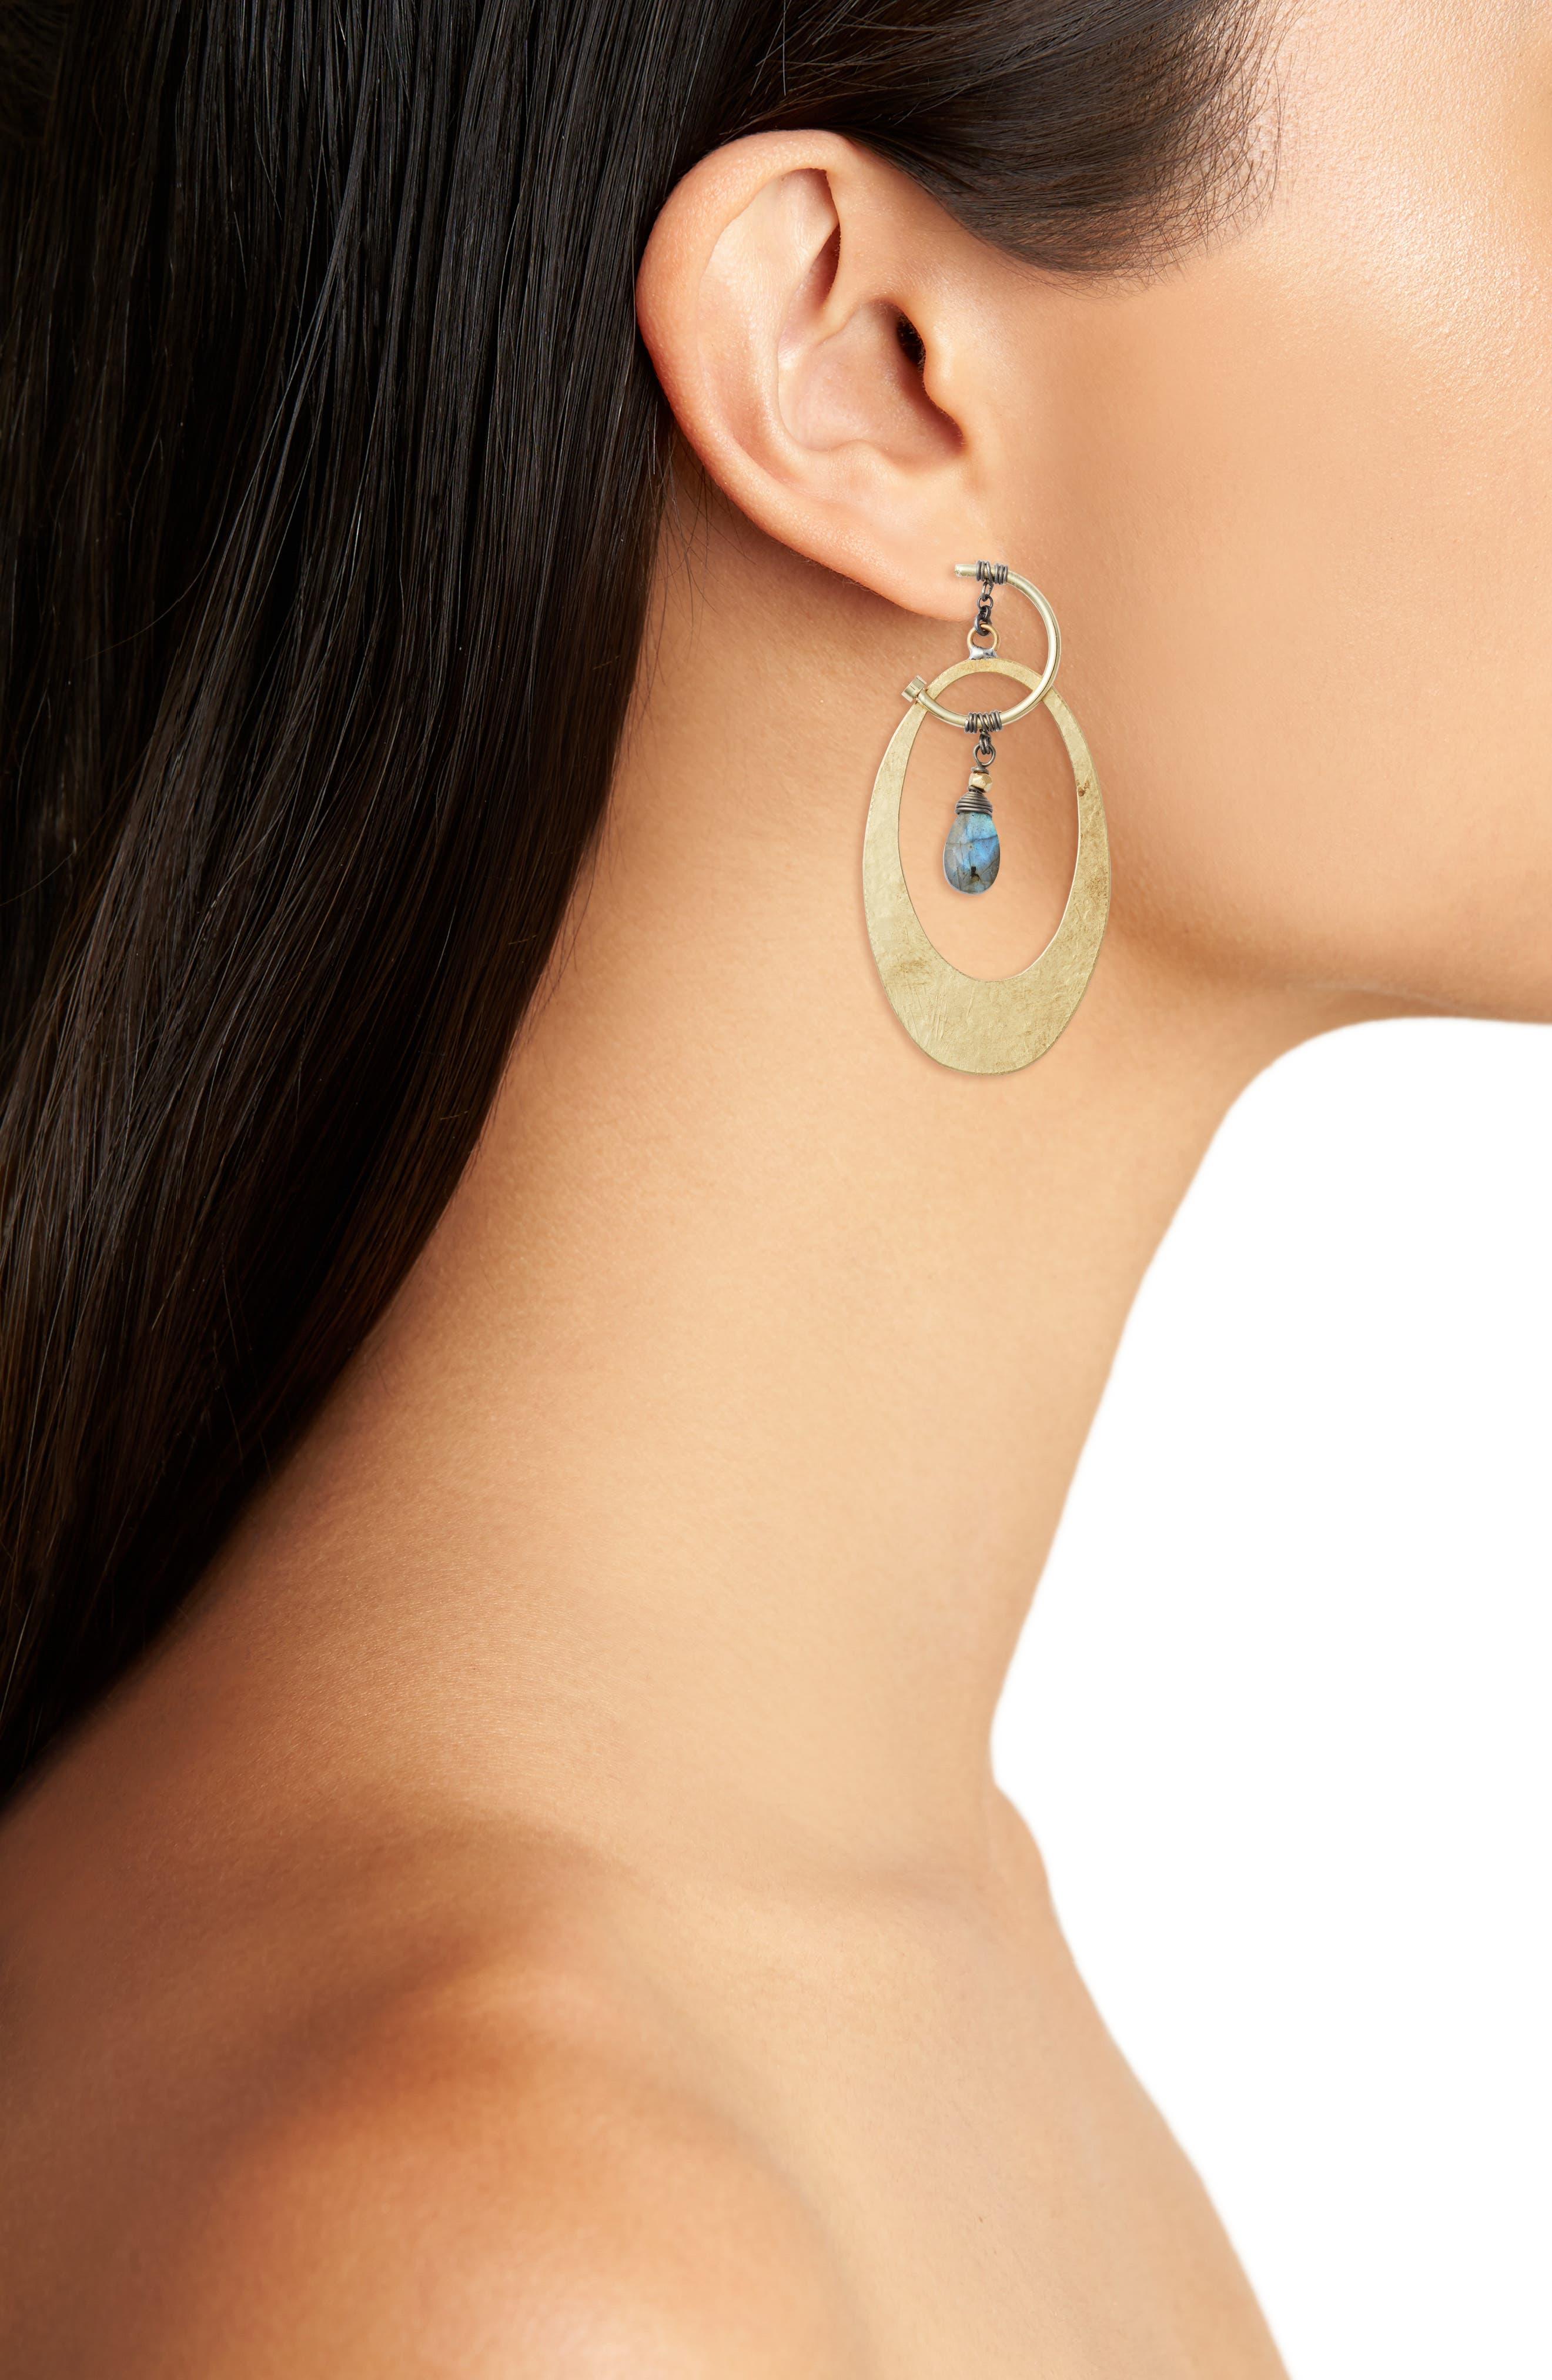 Oval Labradorite Earrings,                             Alternate thumbnail 2, color,                             Grey